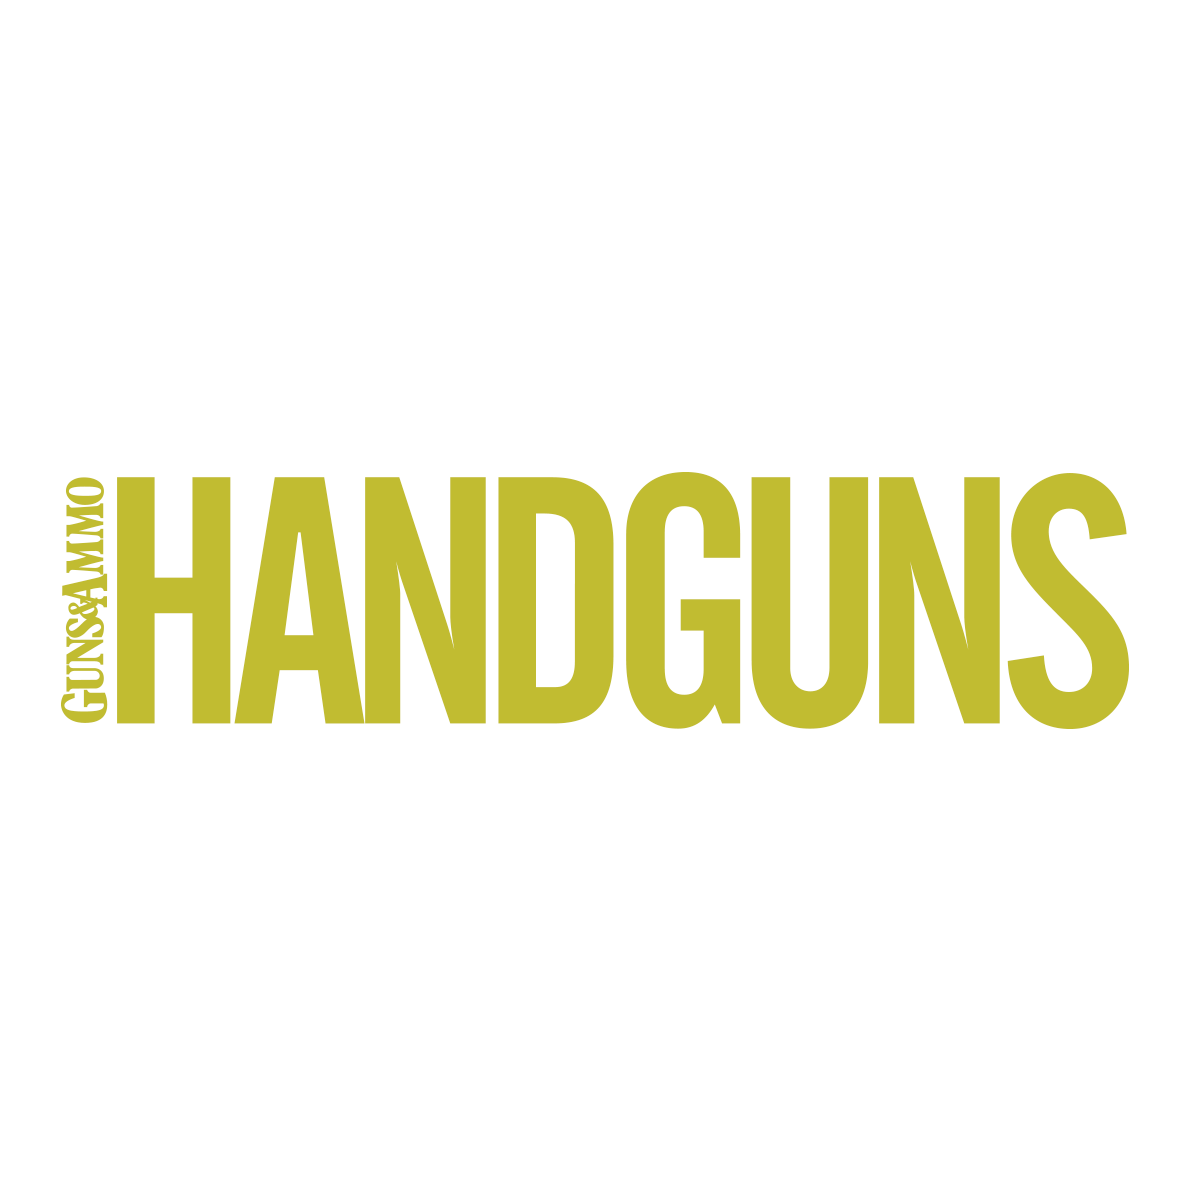 Handguns - The Largest Handgun Magazine in the Country